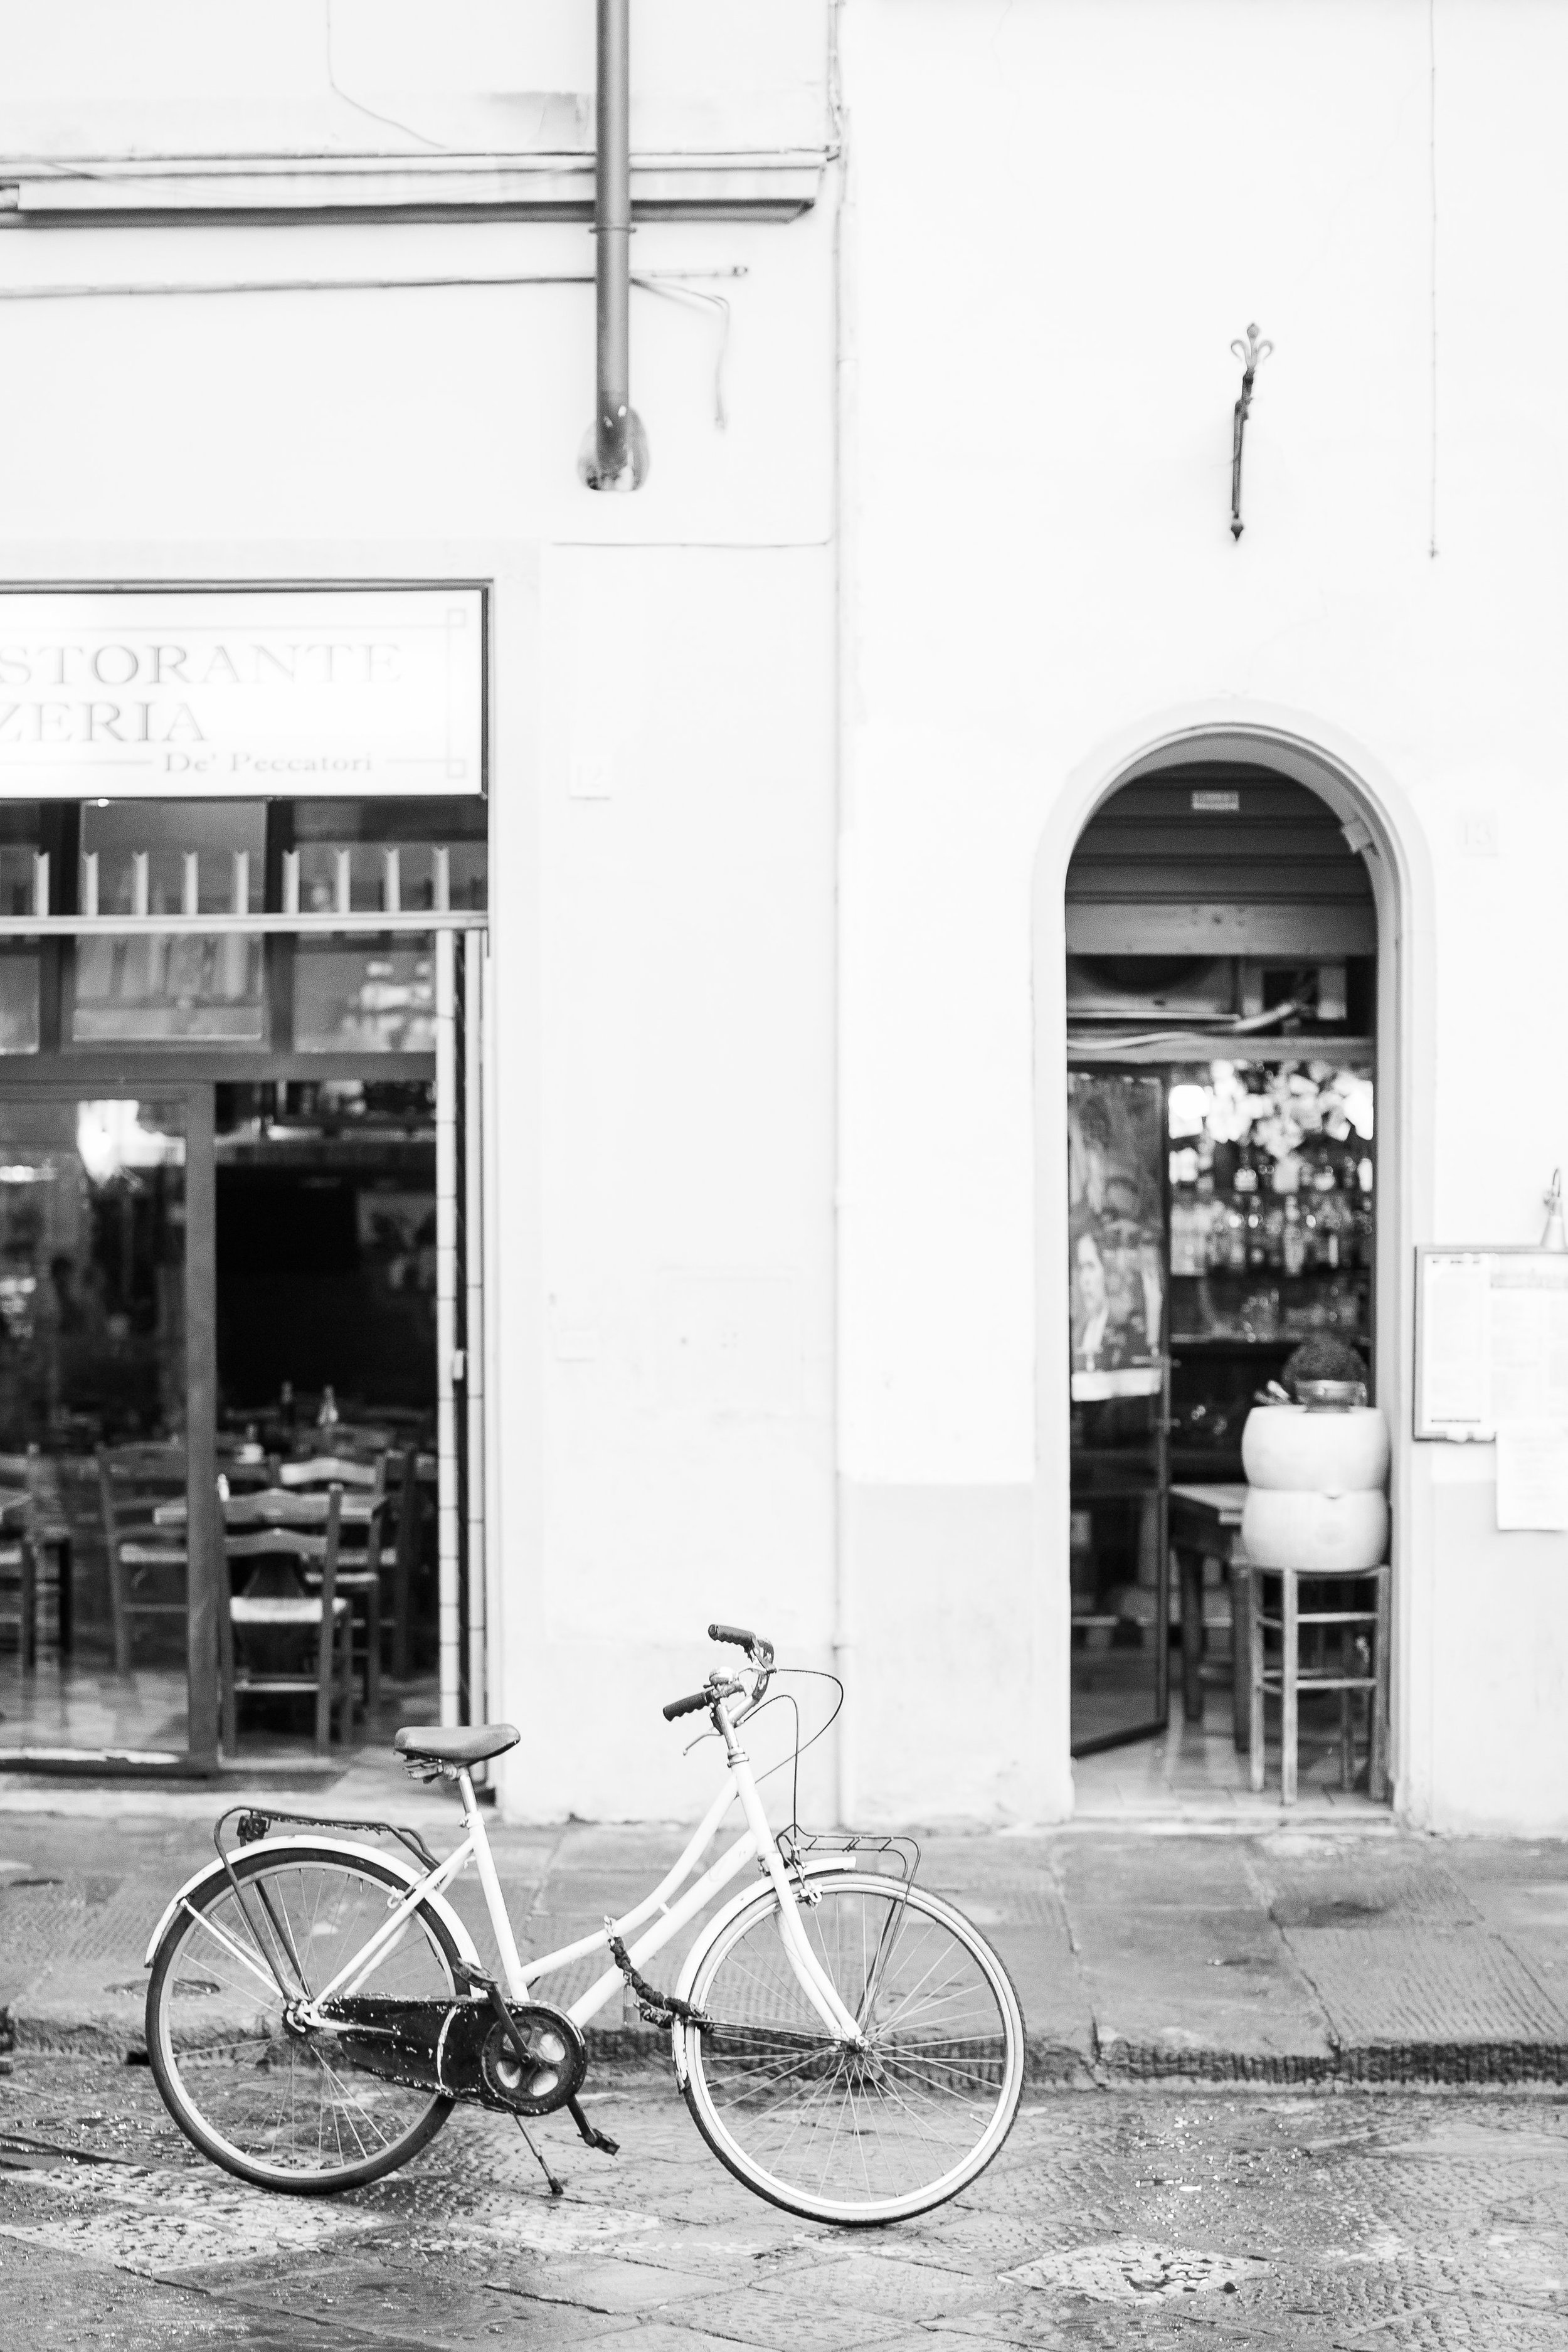 tuscany2015-470.jpg